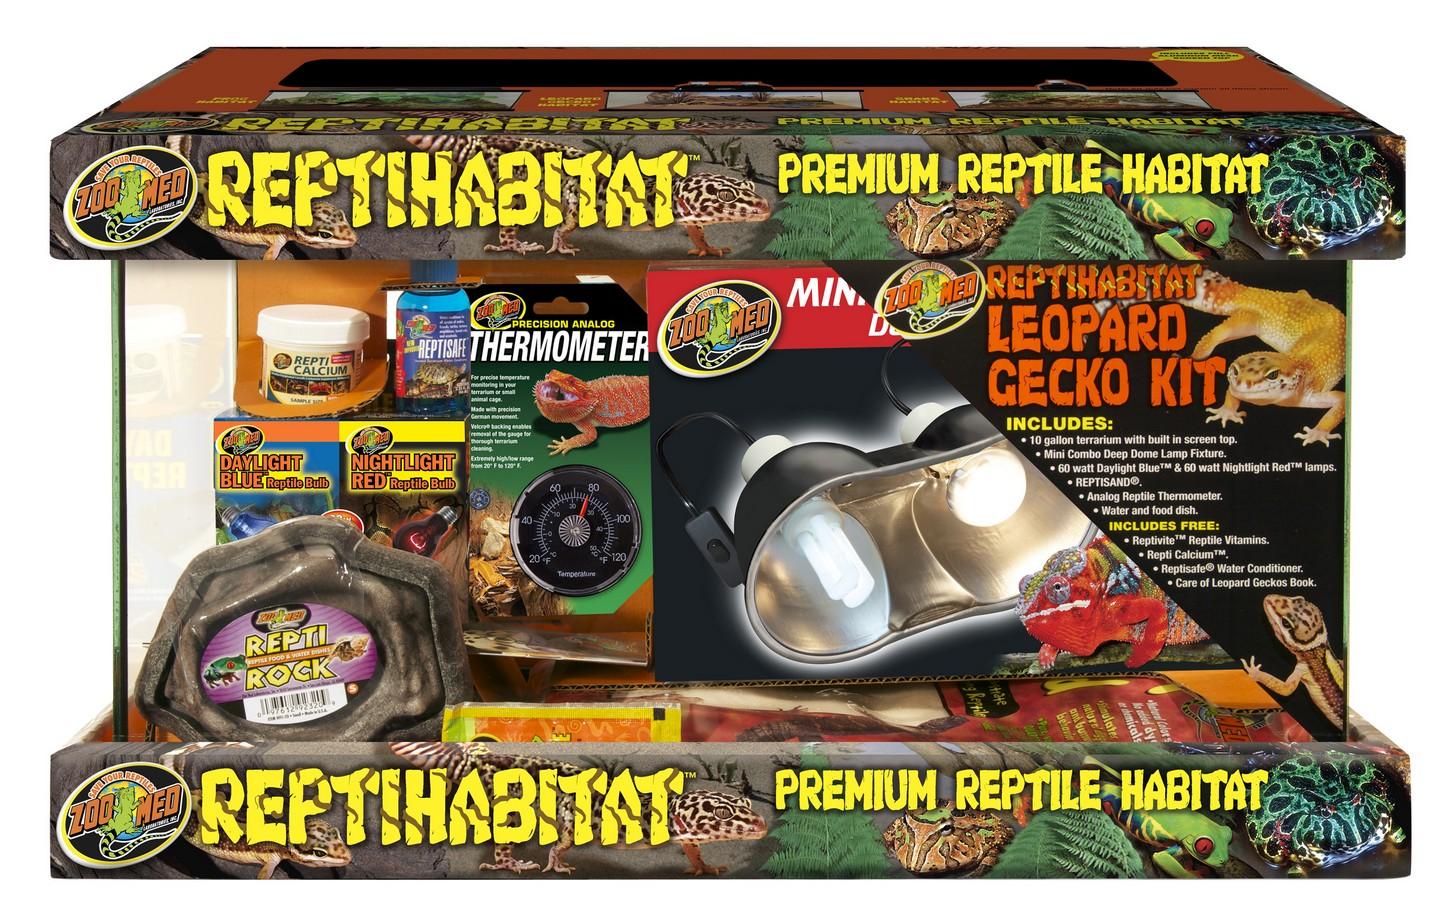 Zoo Med Reptihabitat Premium Reptile Habitat Leopard Gecko Kit, 10-gallon